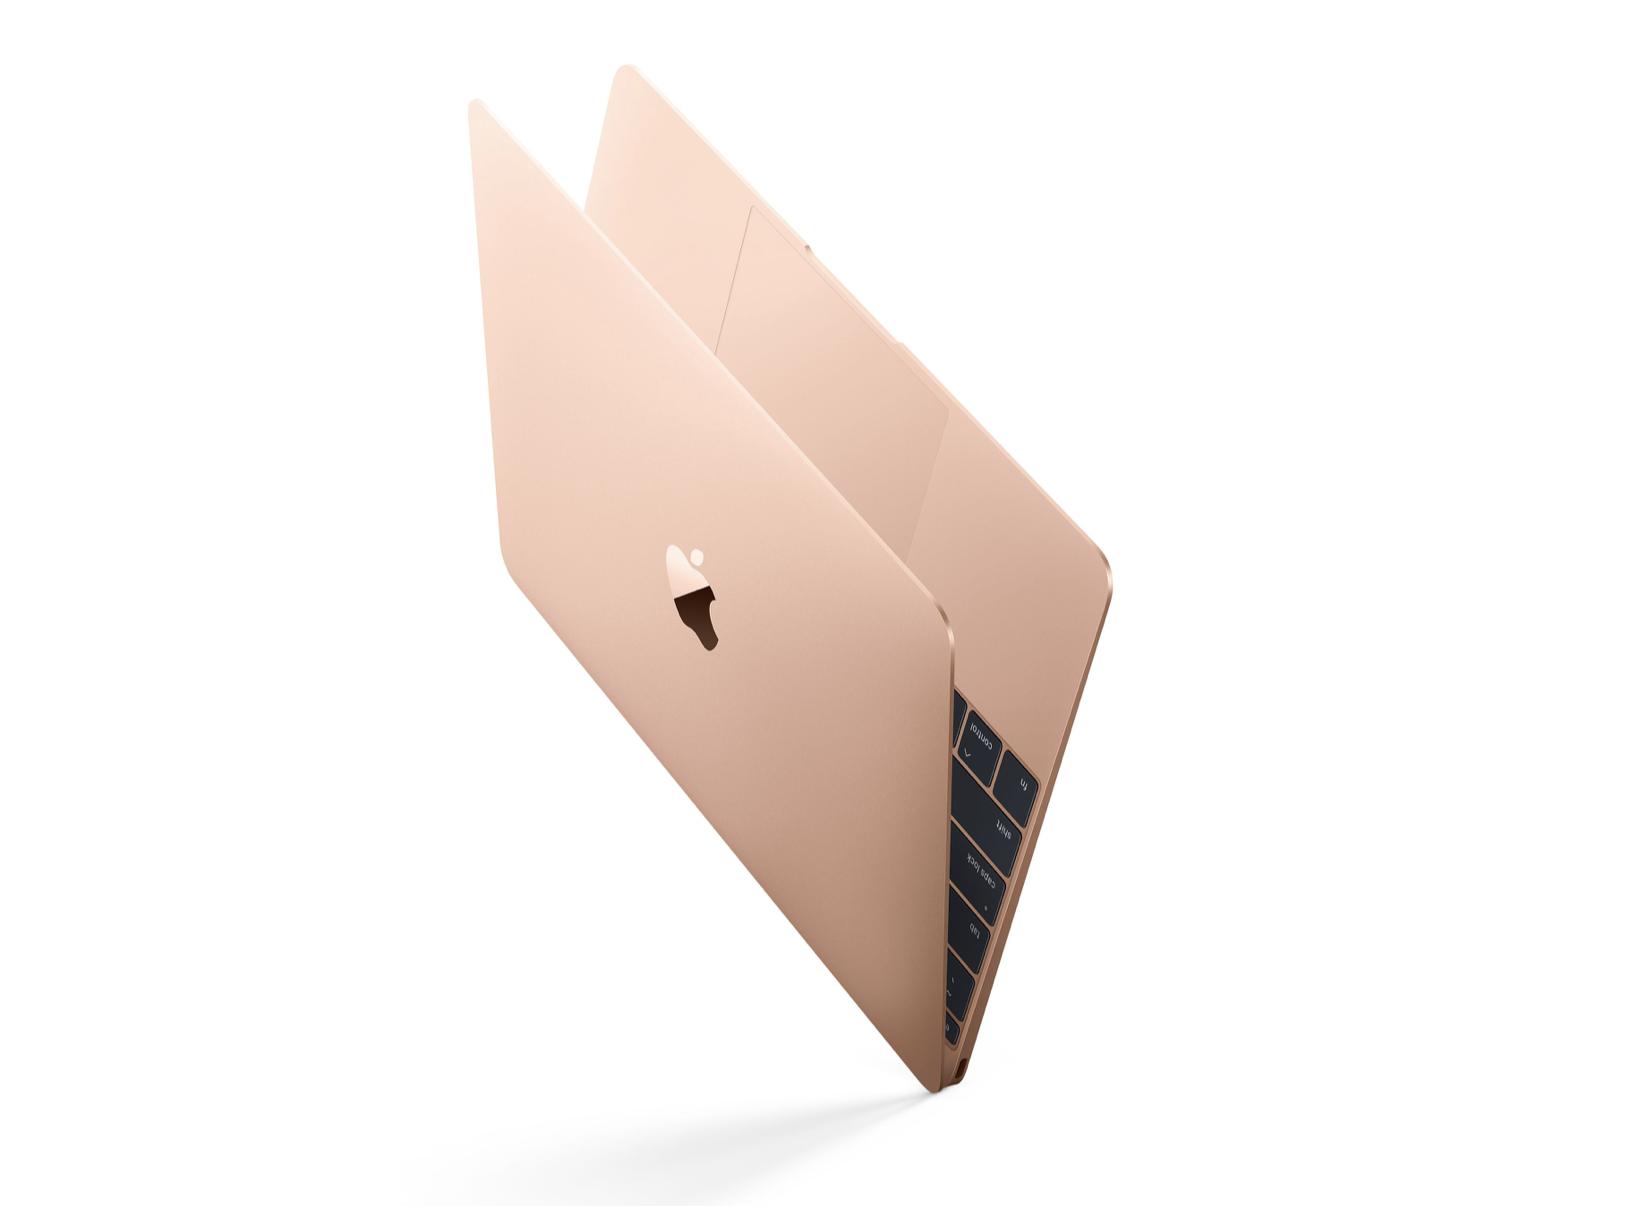 Apple 2018 Macbook - 256 GB - Gold